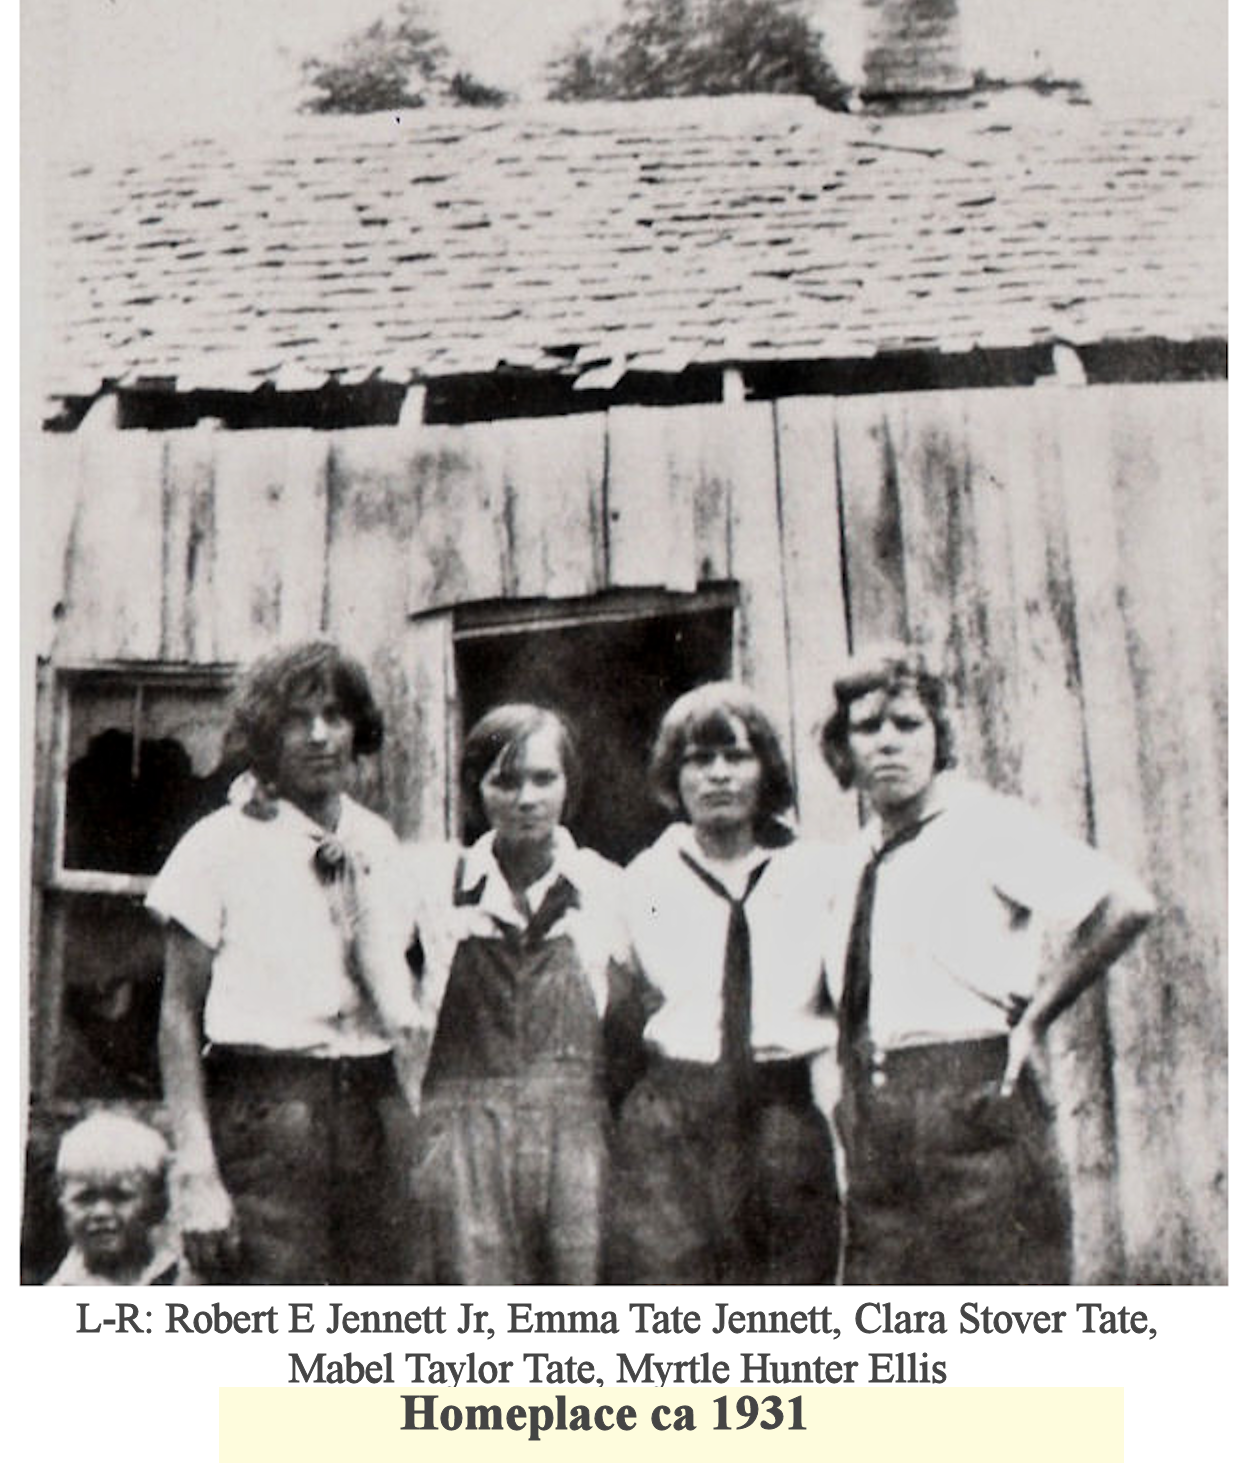 Robert Jennett Jr, Emma Tate Jennett, Clara Stover Tate, Mabel Taylor Tate, Myrtle Hunter Ellis at Homeplace 1931.png